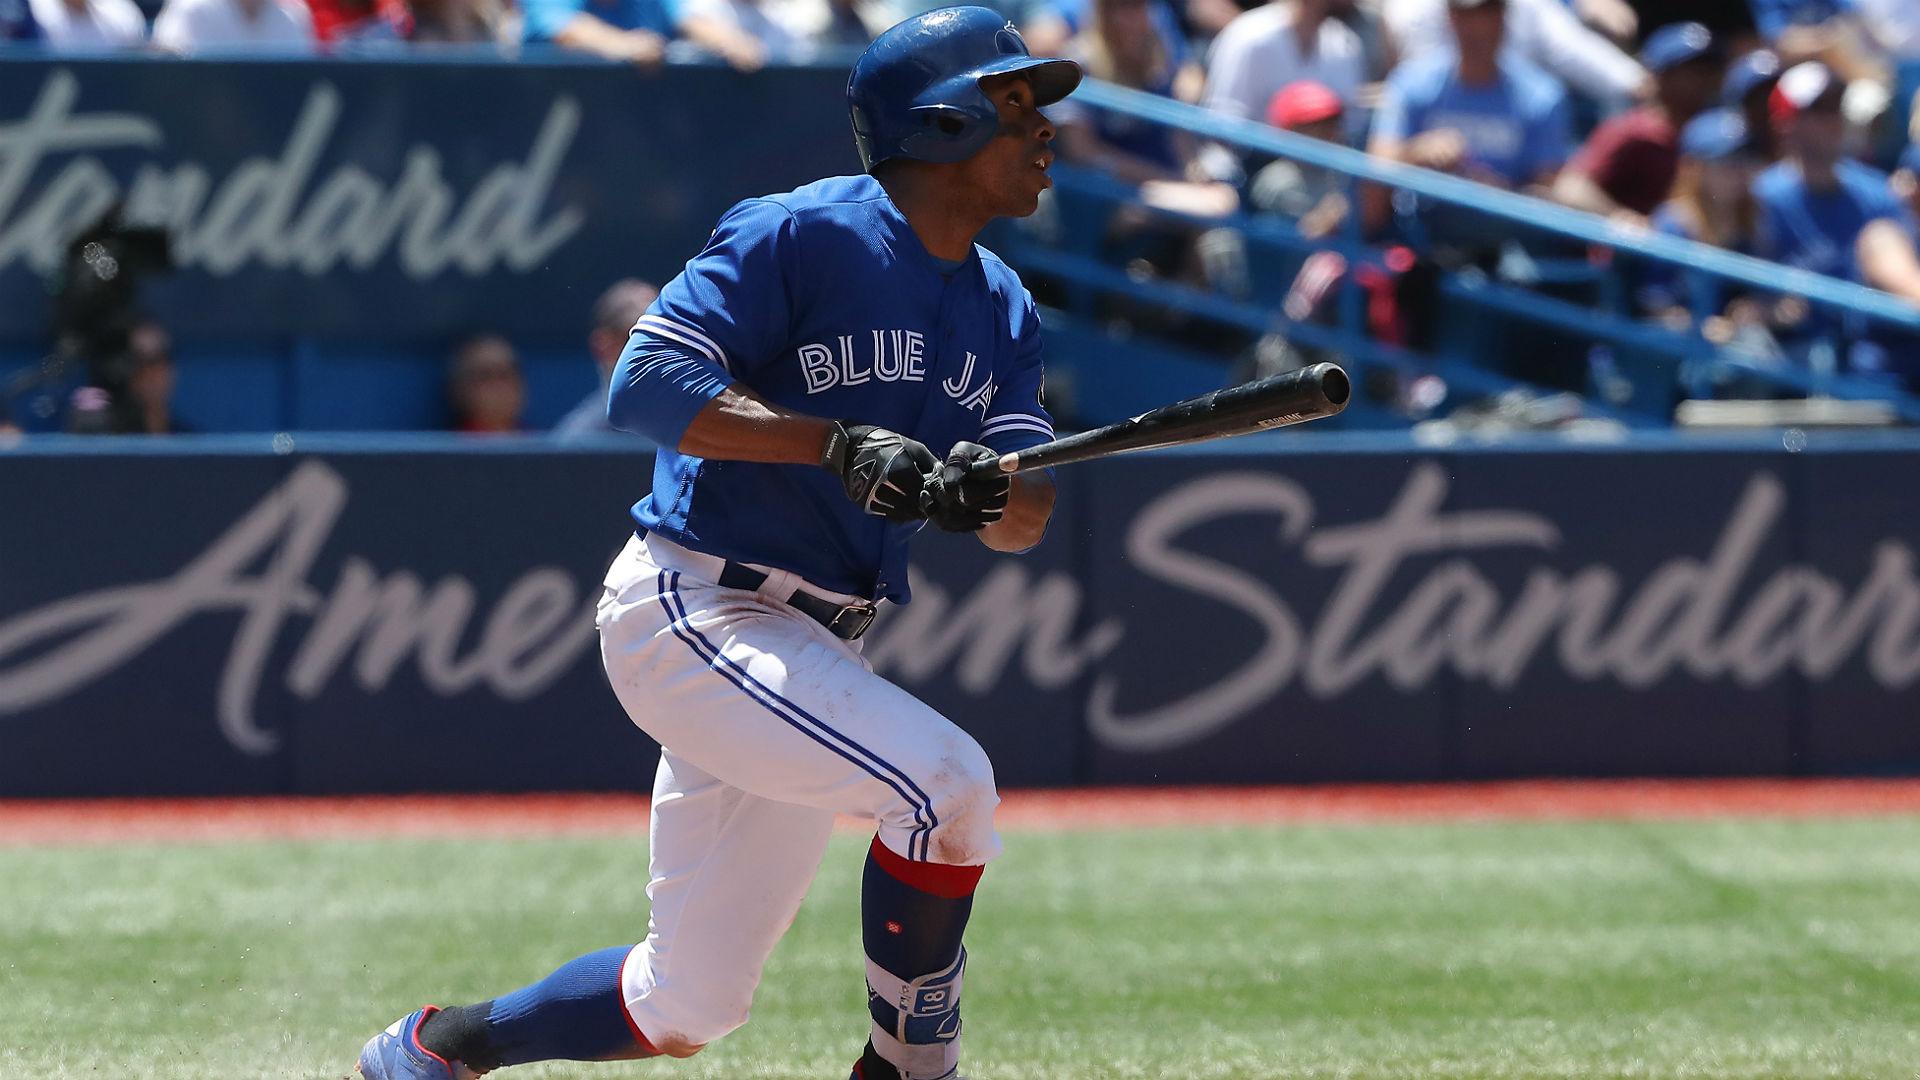 MLB trade news: Blue Jays send Curtis Granderson to Brewers